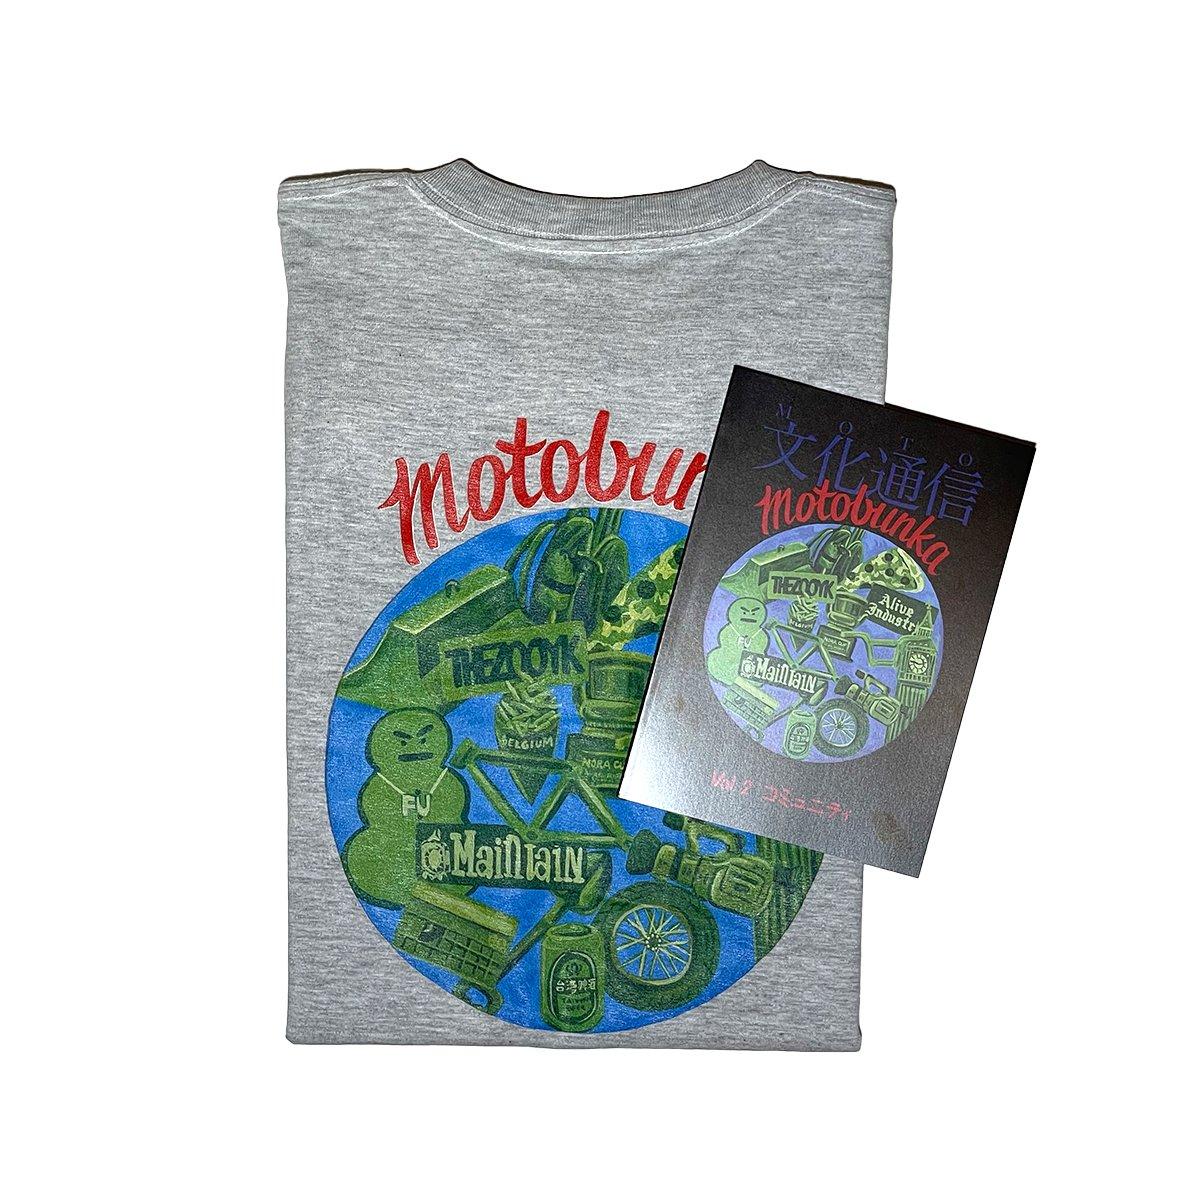 「MOTO文化通信Vol.2」明日から全国各地で販売開始